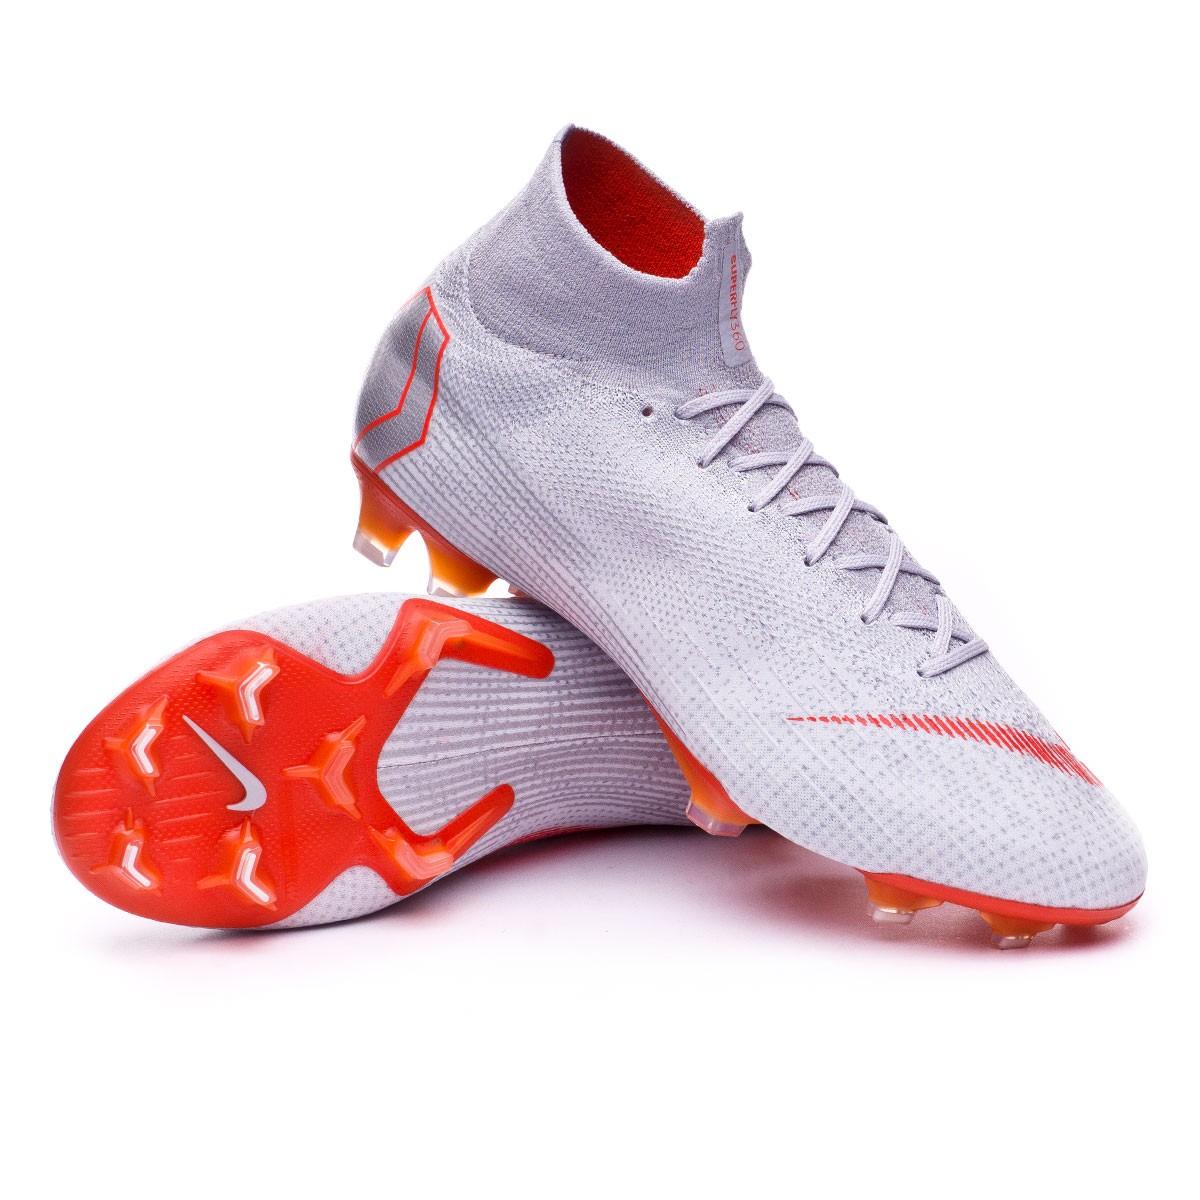 0d1713c24a131 Football Boots Nike Mercurial Superfly VI Elite FG Wolf grey-Light ...